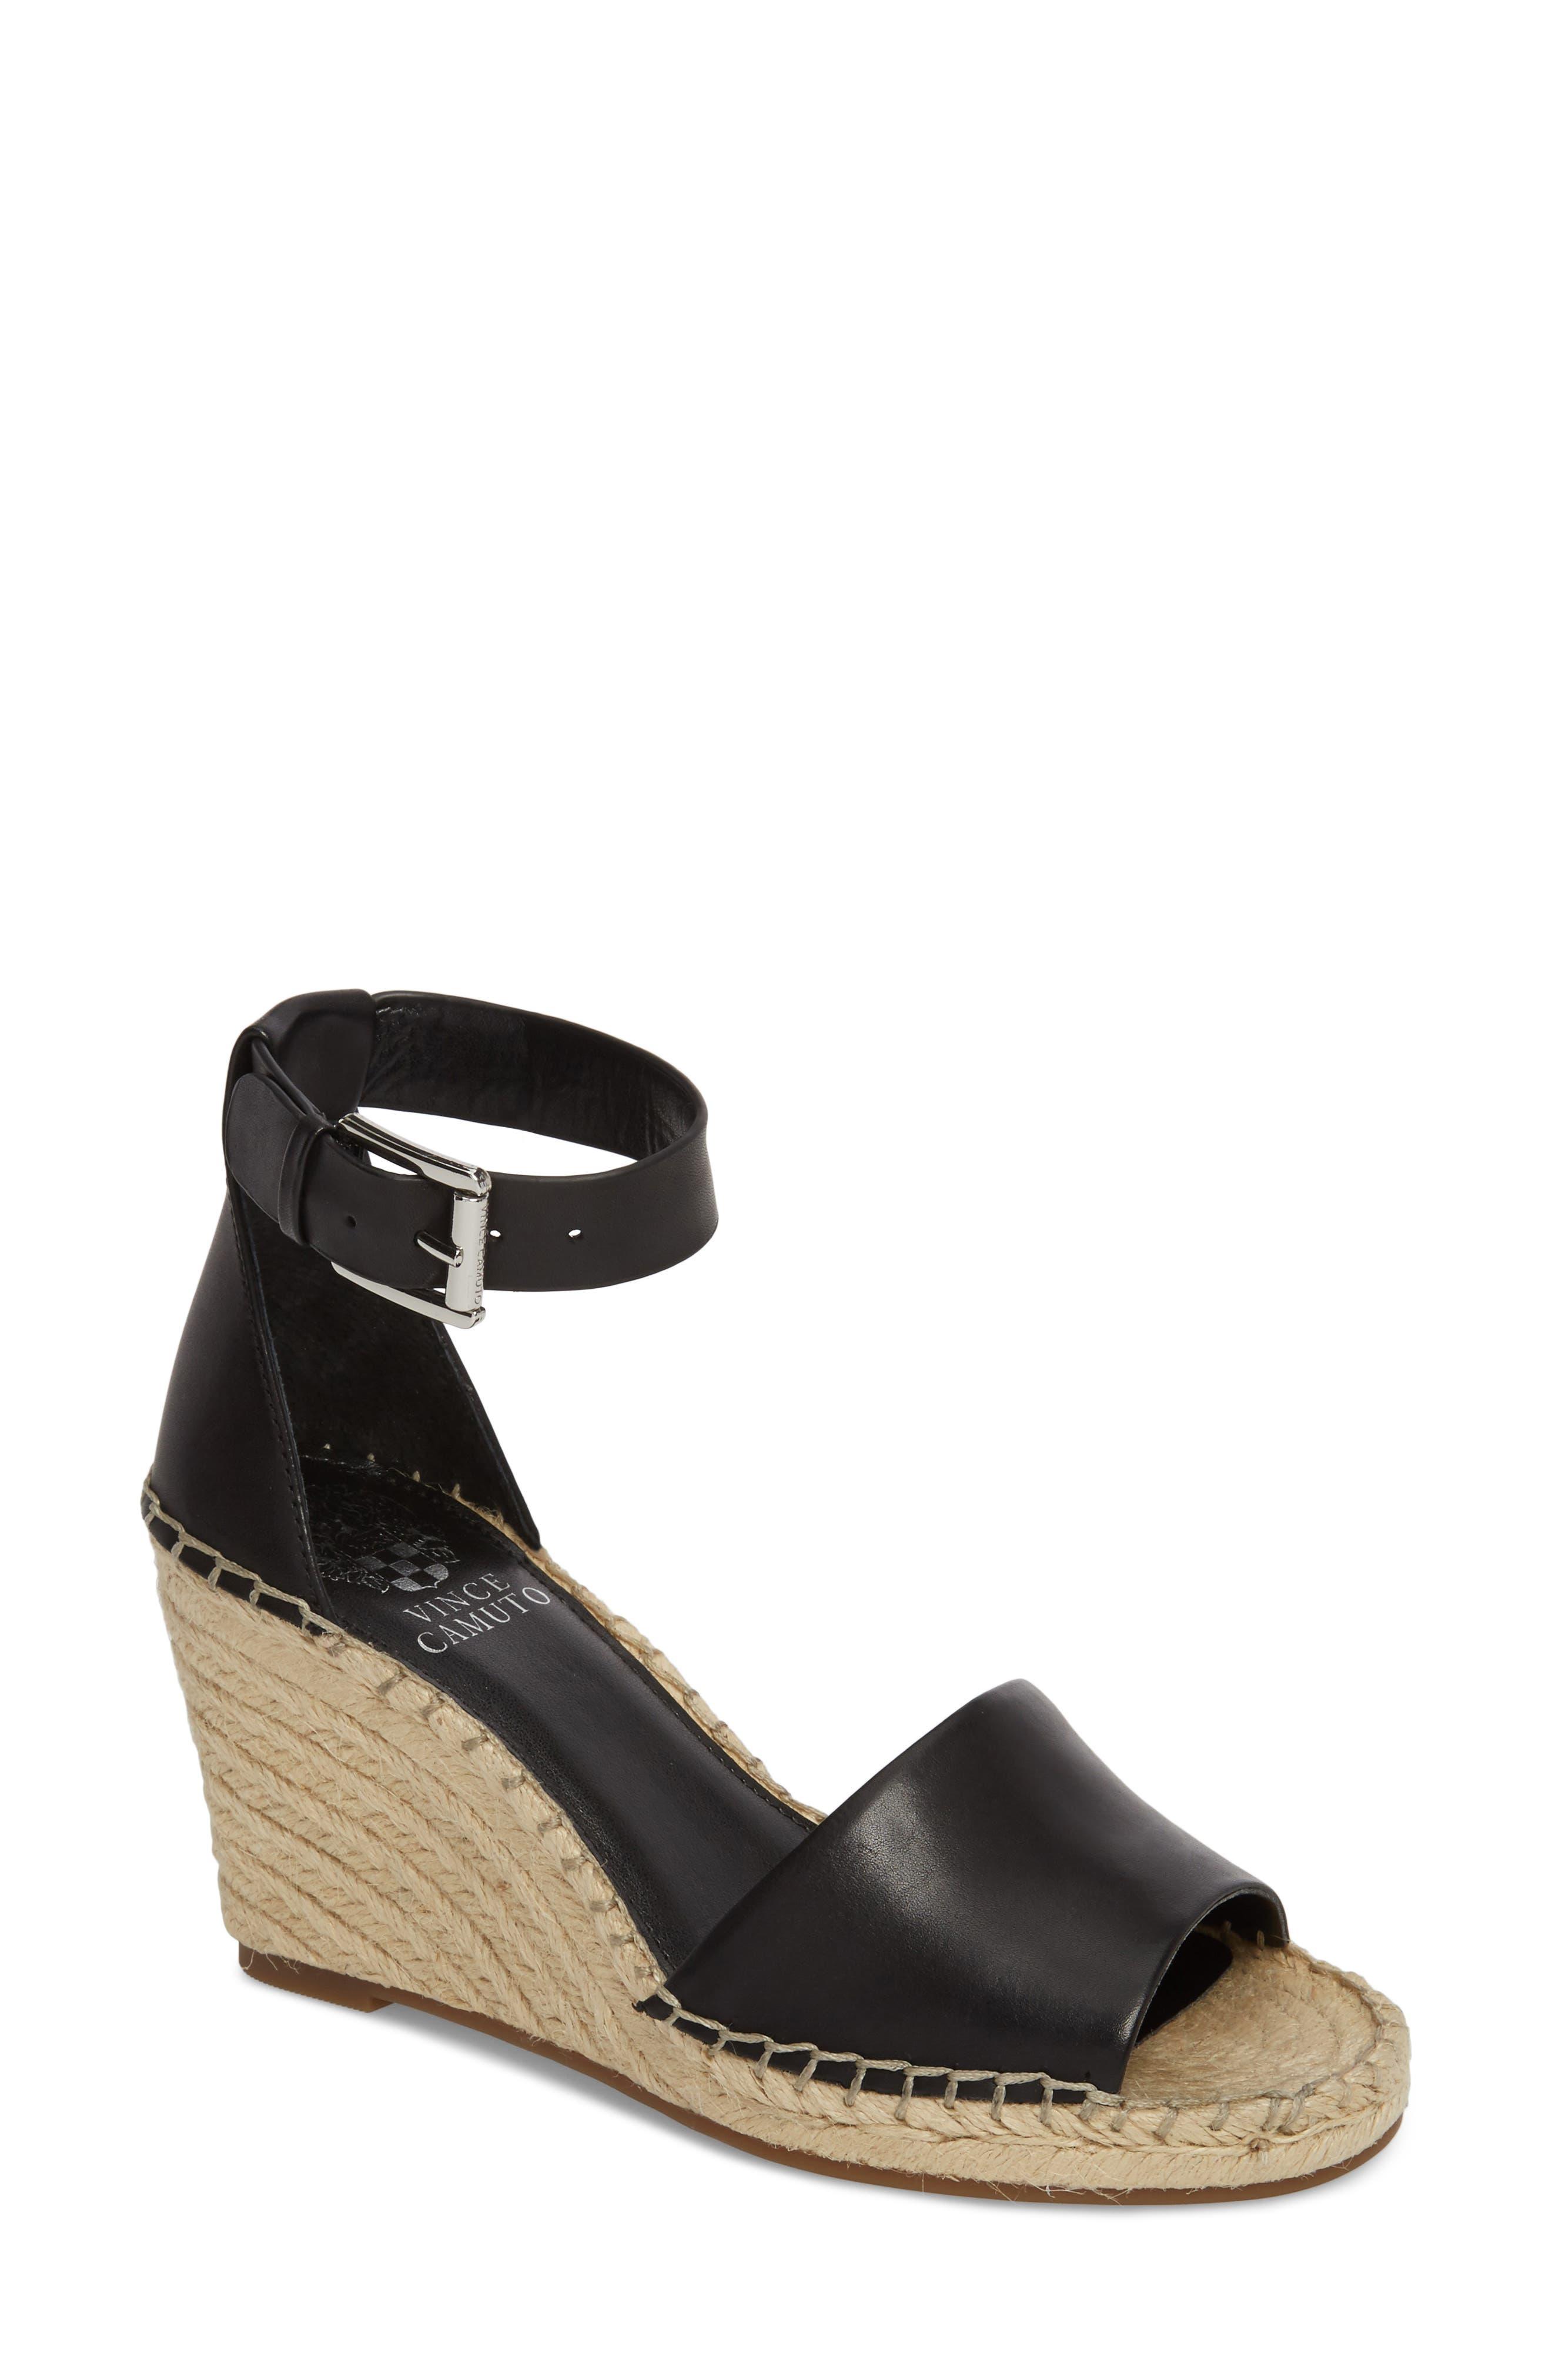 Vince Camuto Leera Wedge Sandal (Women)